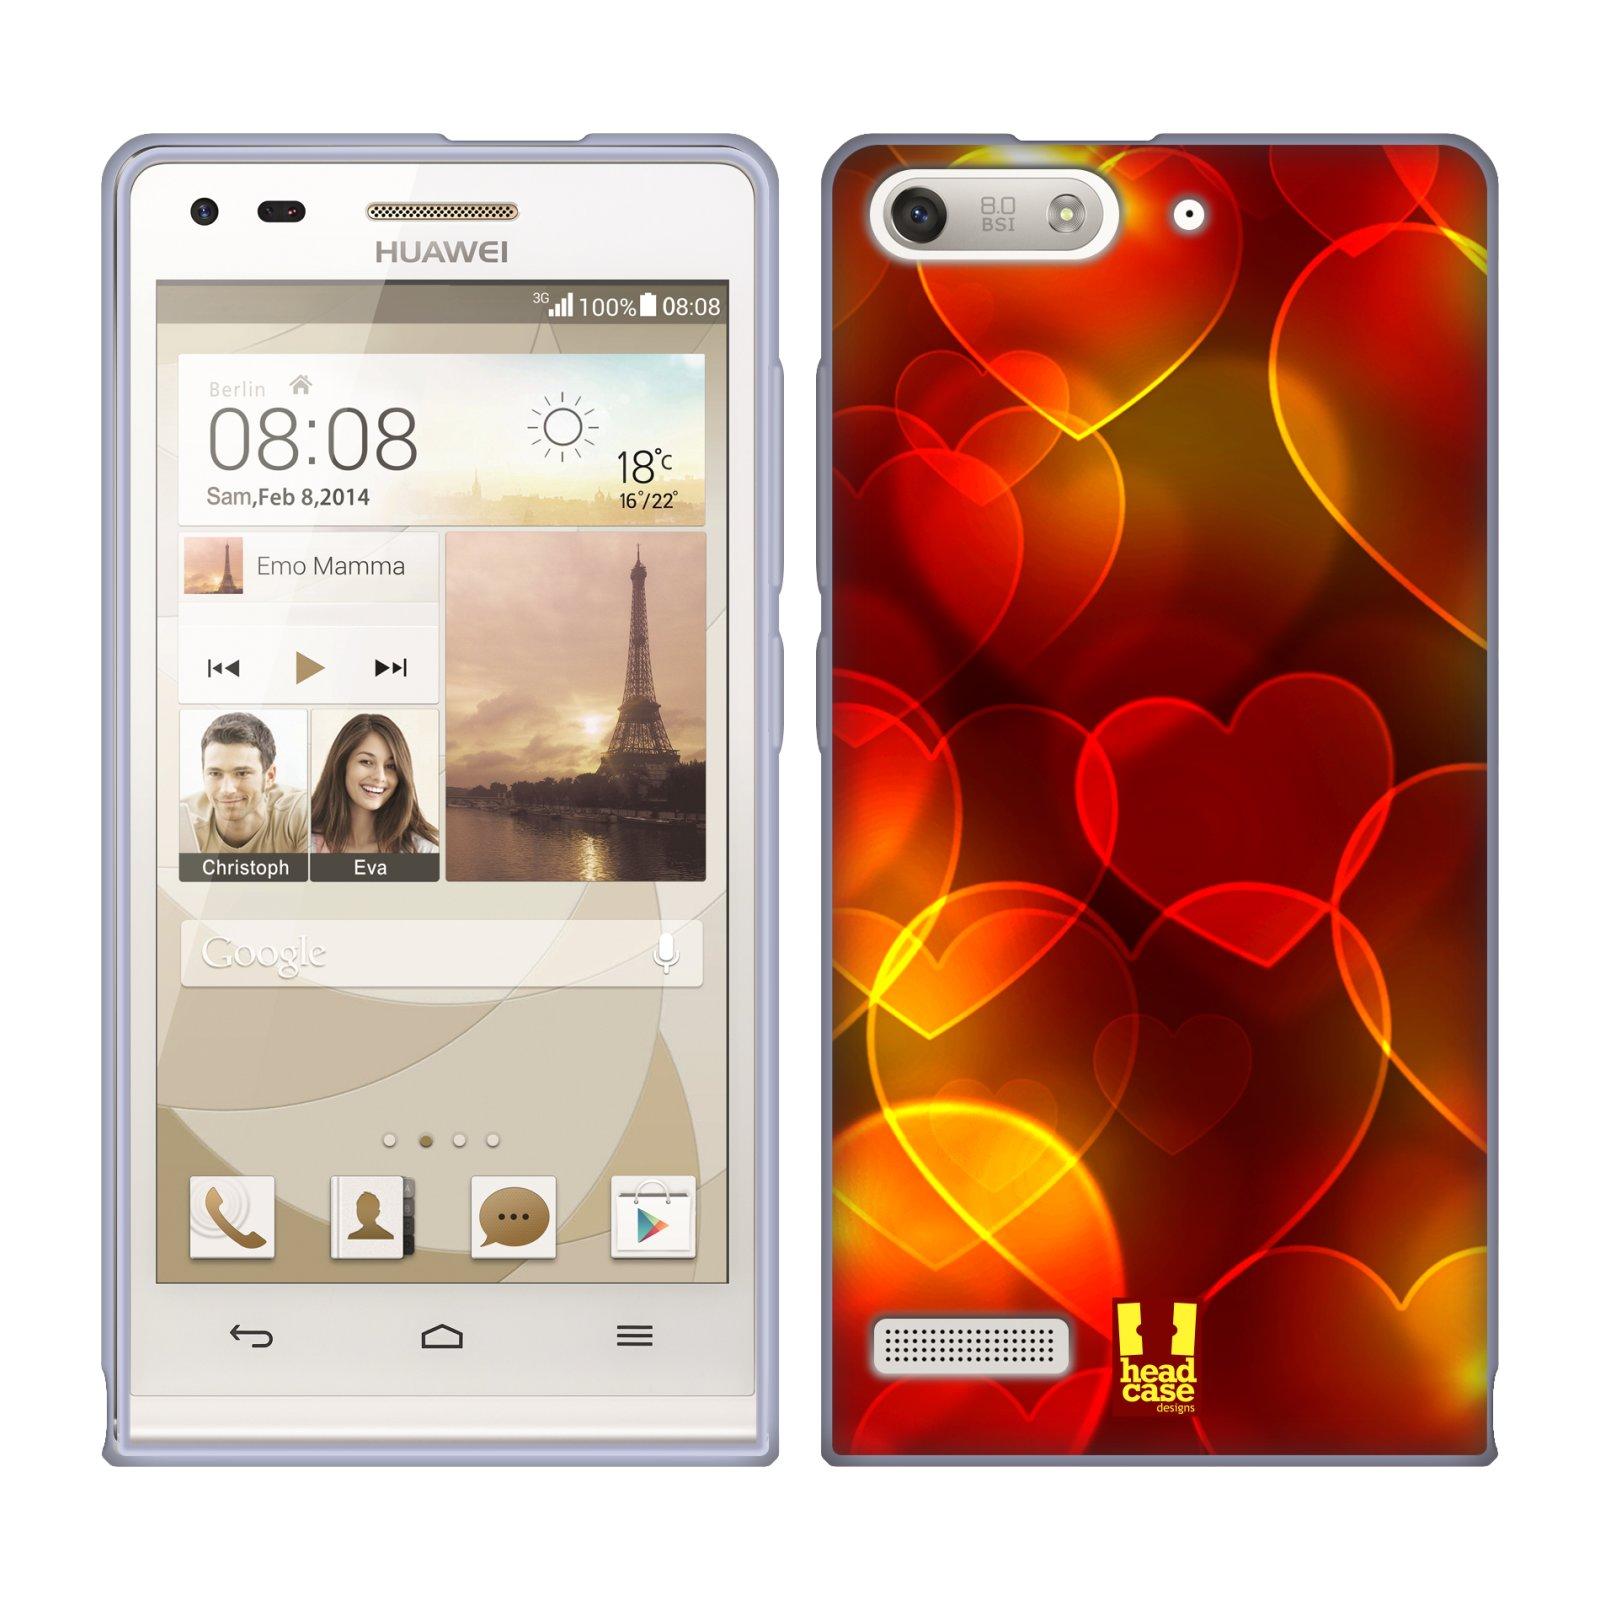 HEAD CASE silikonový obal na mobil Huawei Ascend G6 srdíčka kaleidoskop Bokeh